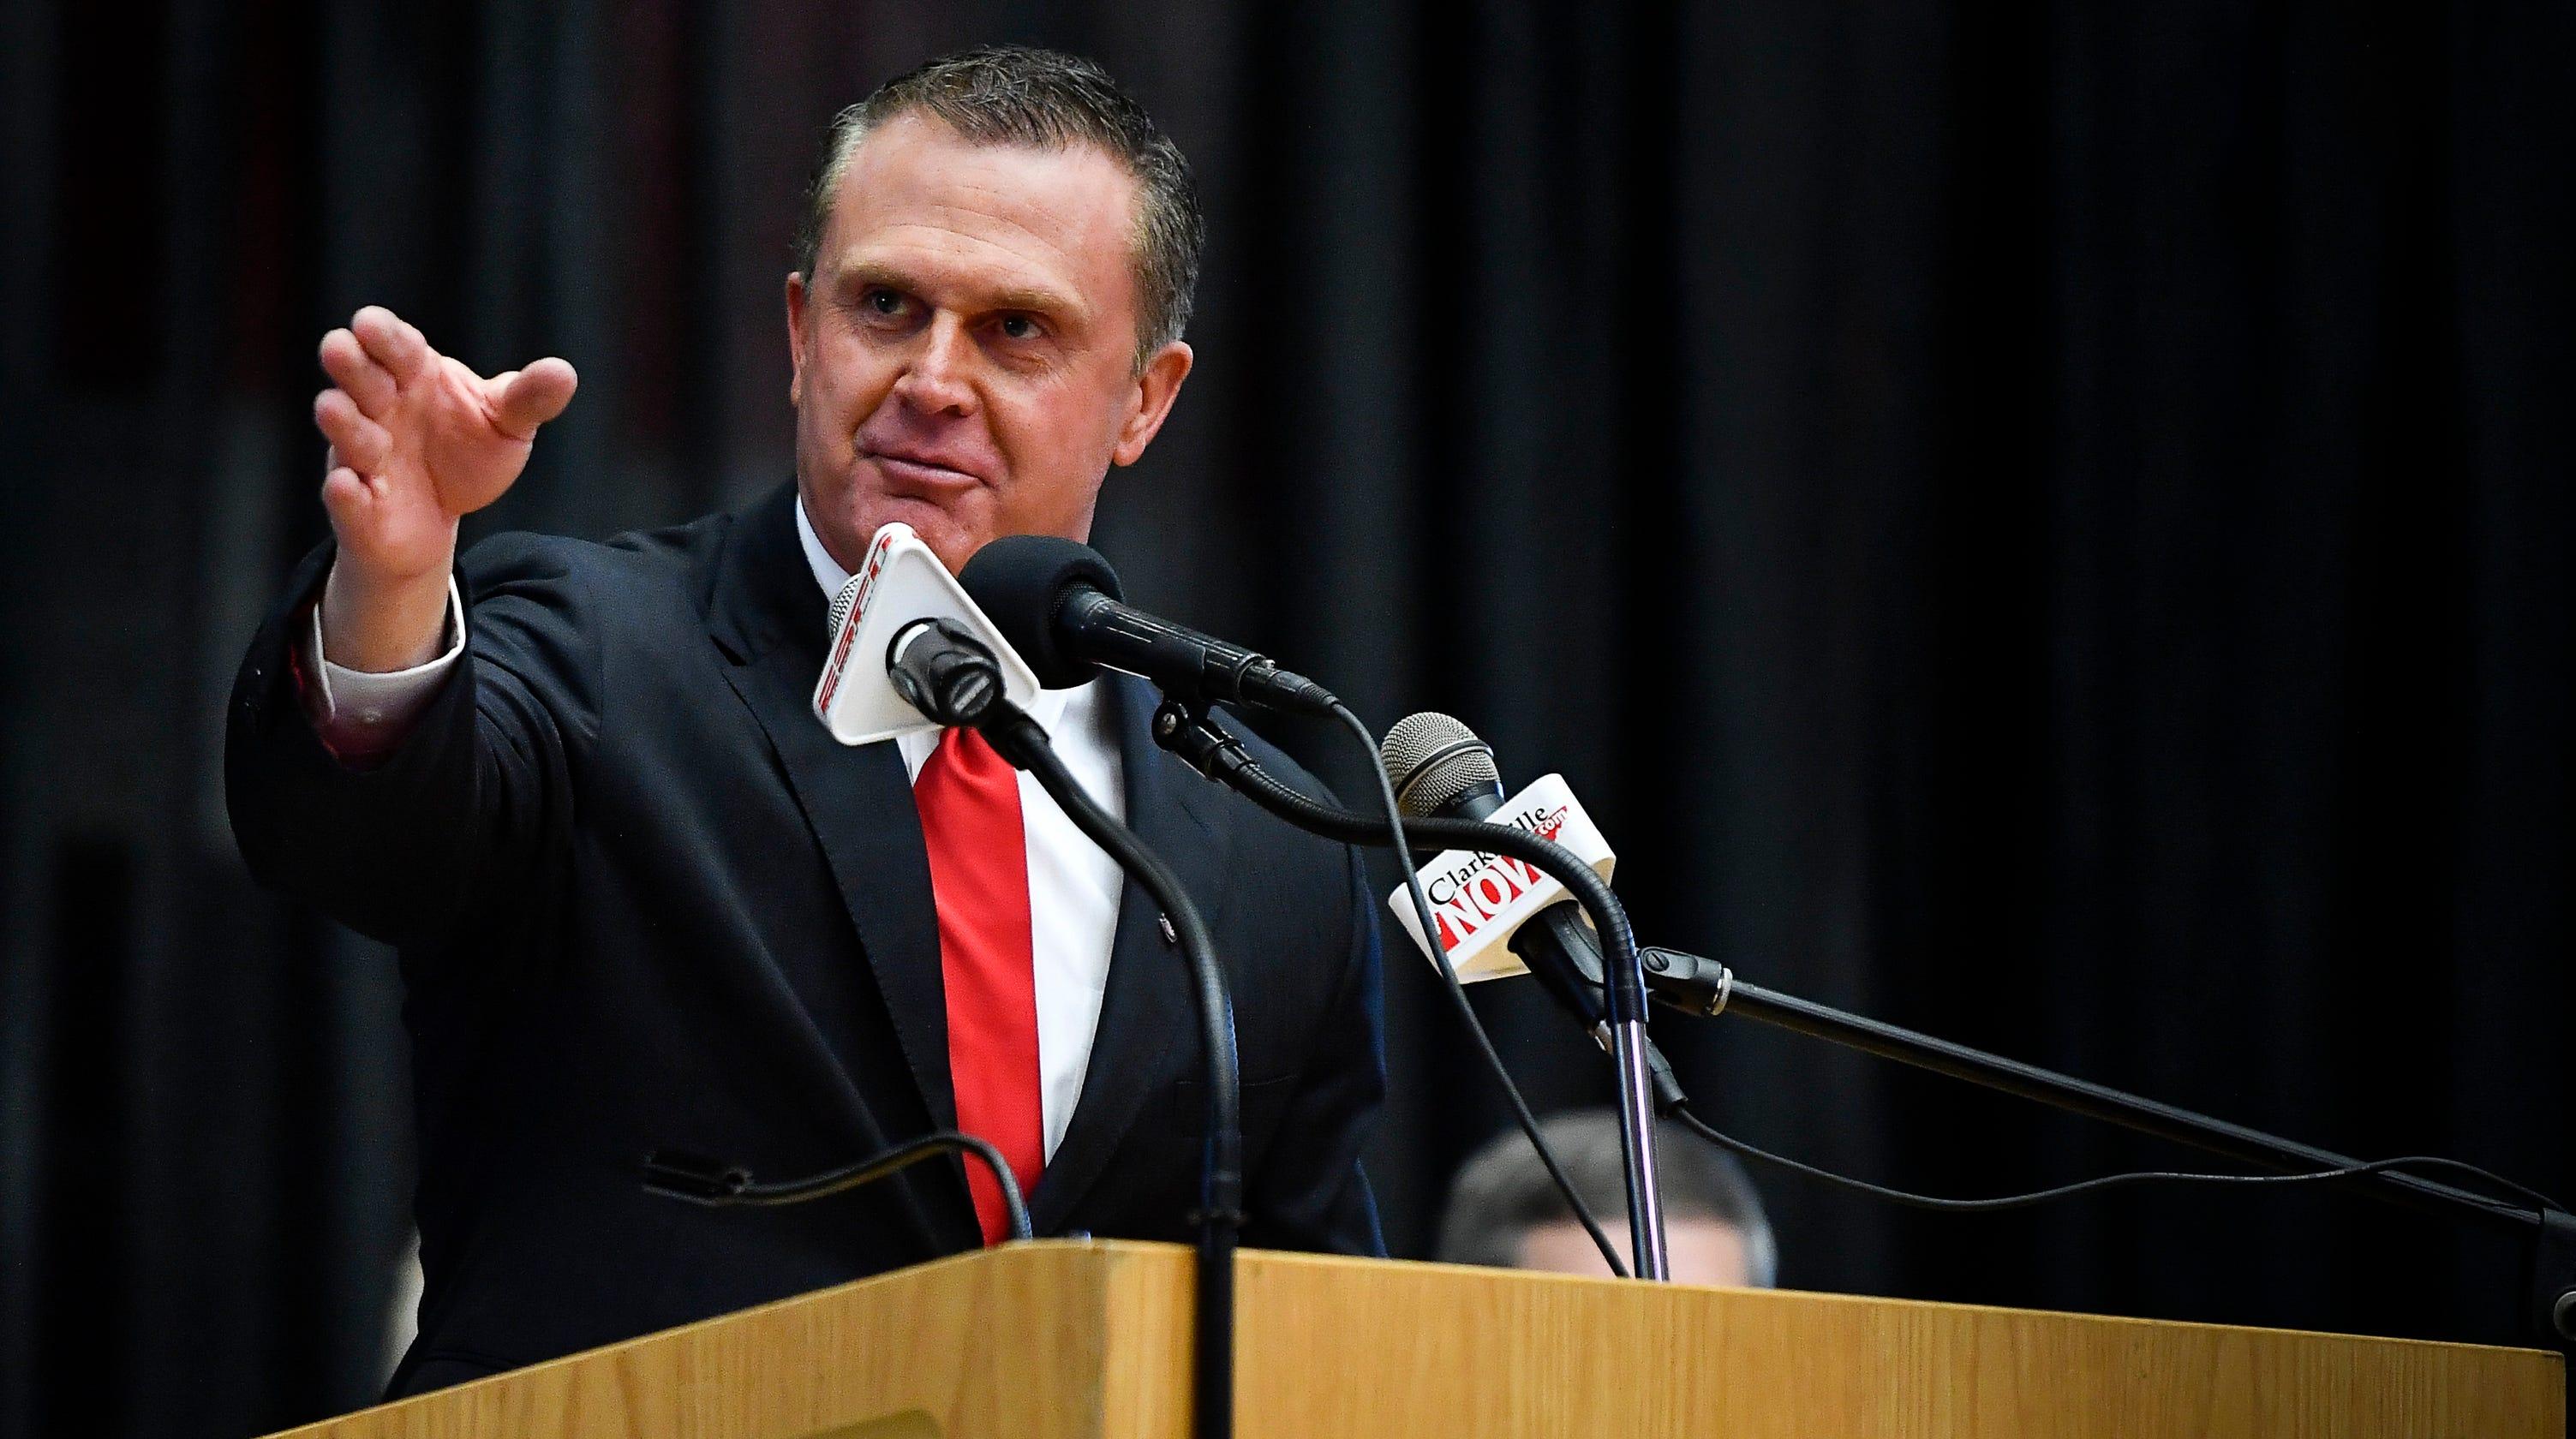 PHOTOS: APSU introduces new football coach, Mark Hudspeth ...